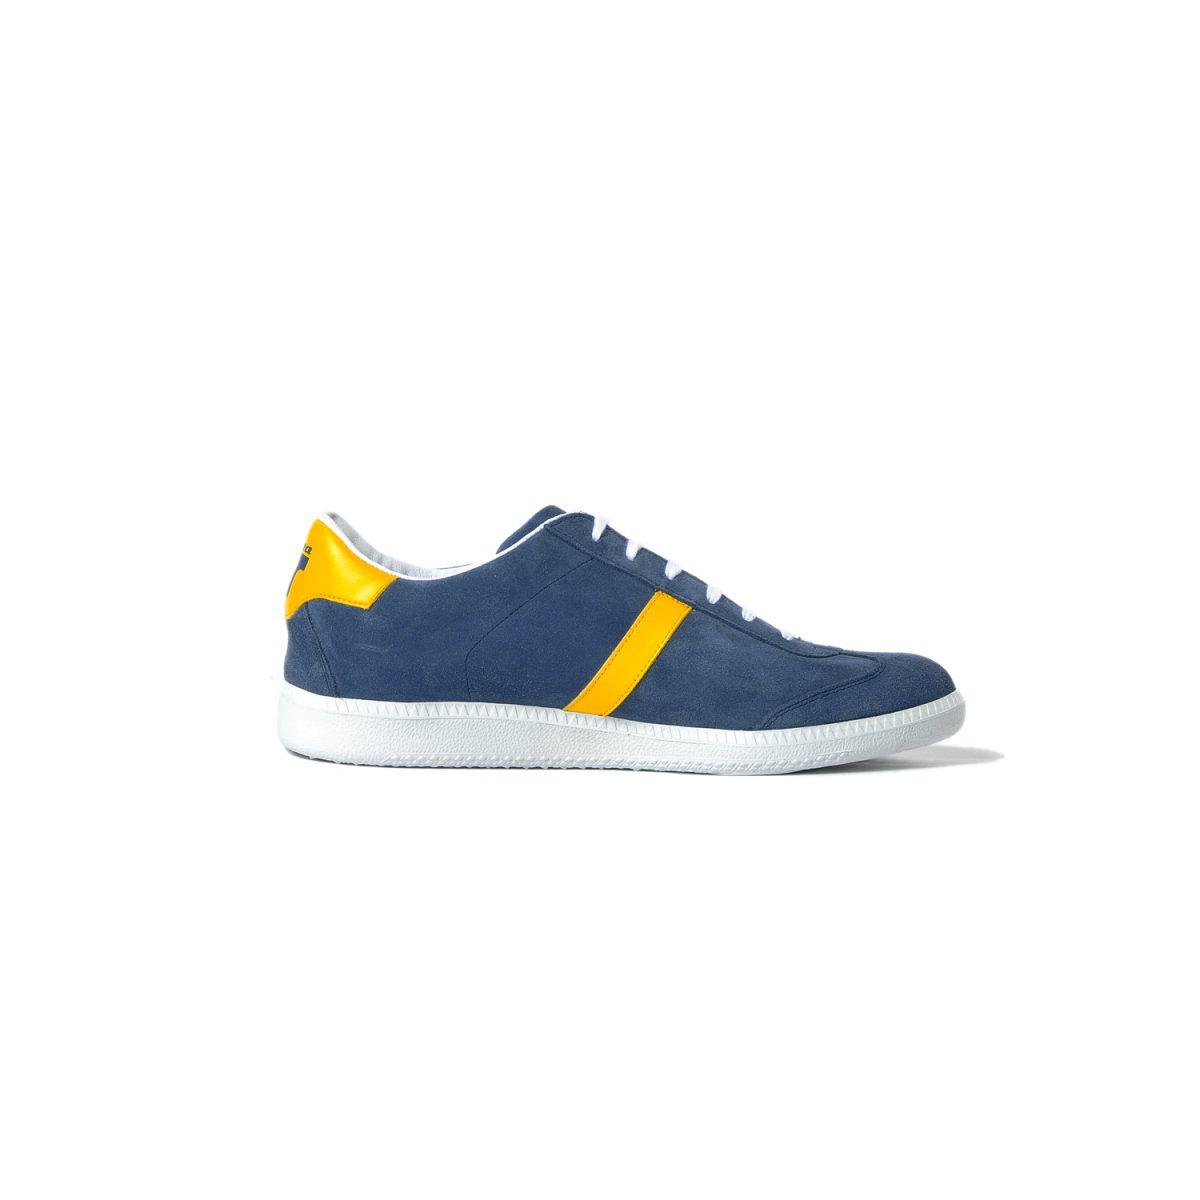 Tisza shoes - Comfort - Navy-yellow